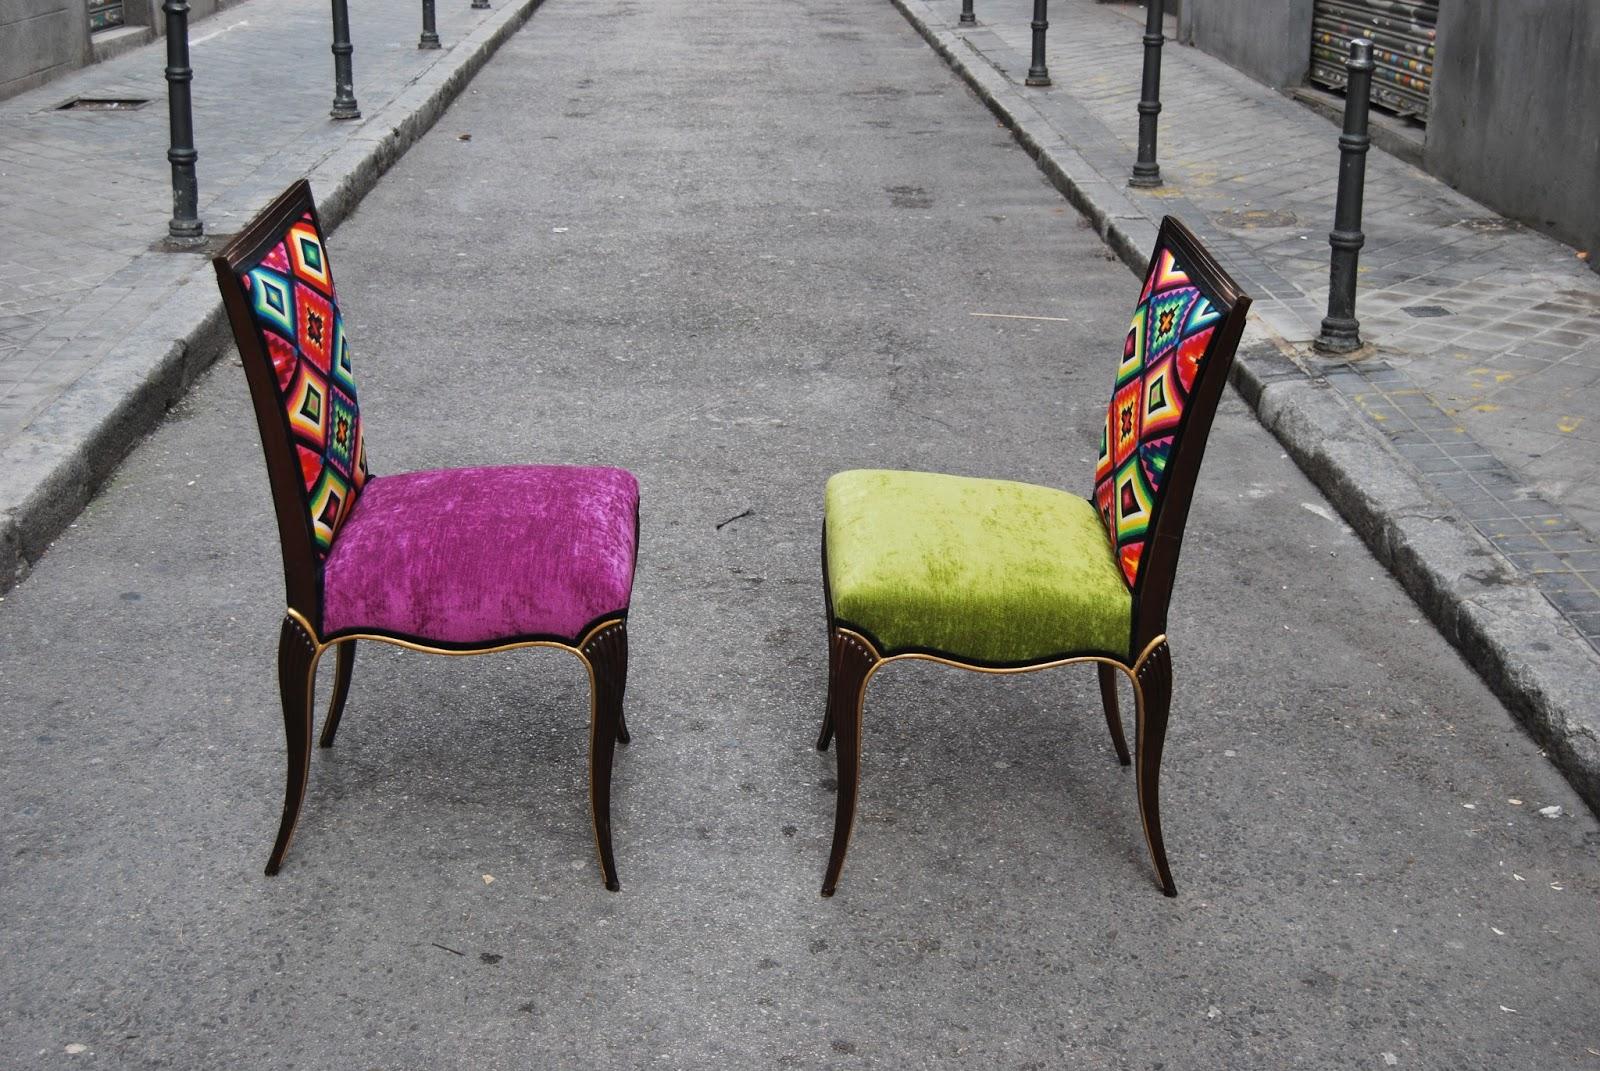 Sillas tapizadas con tela de motivos mejicanos la tapicera for Sillas negras tapizadas